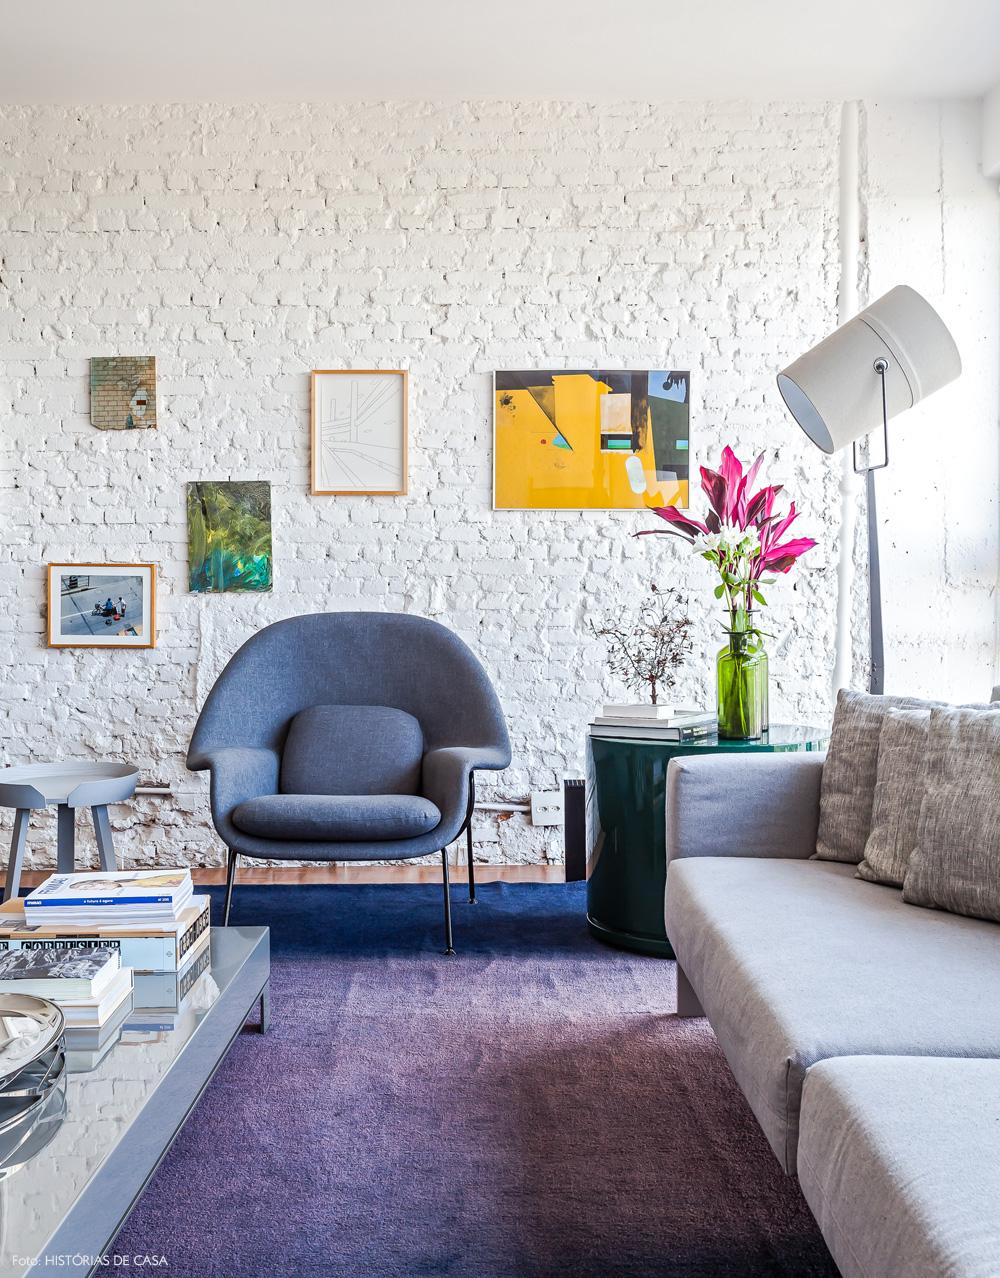 06-decoracao-sala-estar-parede-tijolinho-branco-poltrona-womb